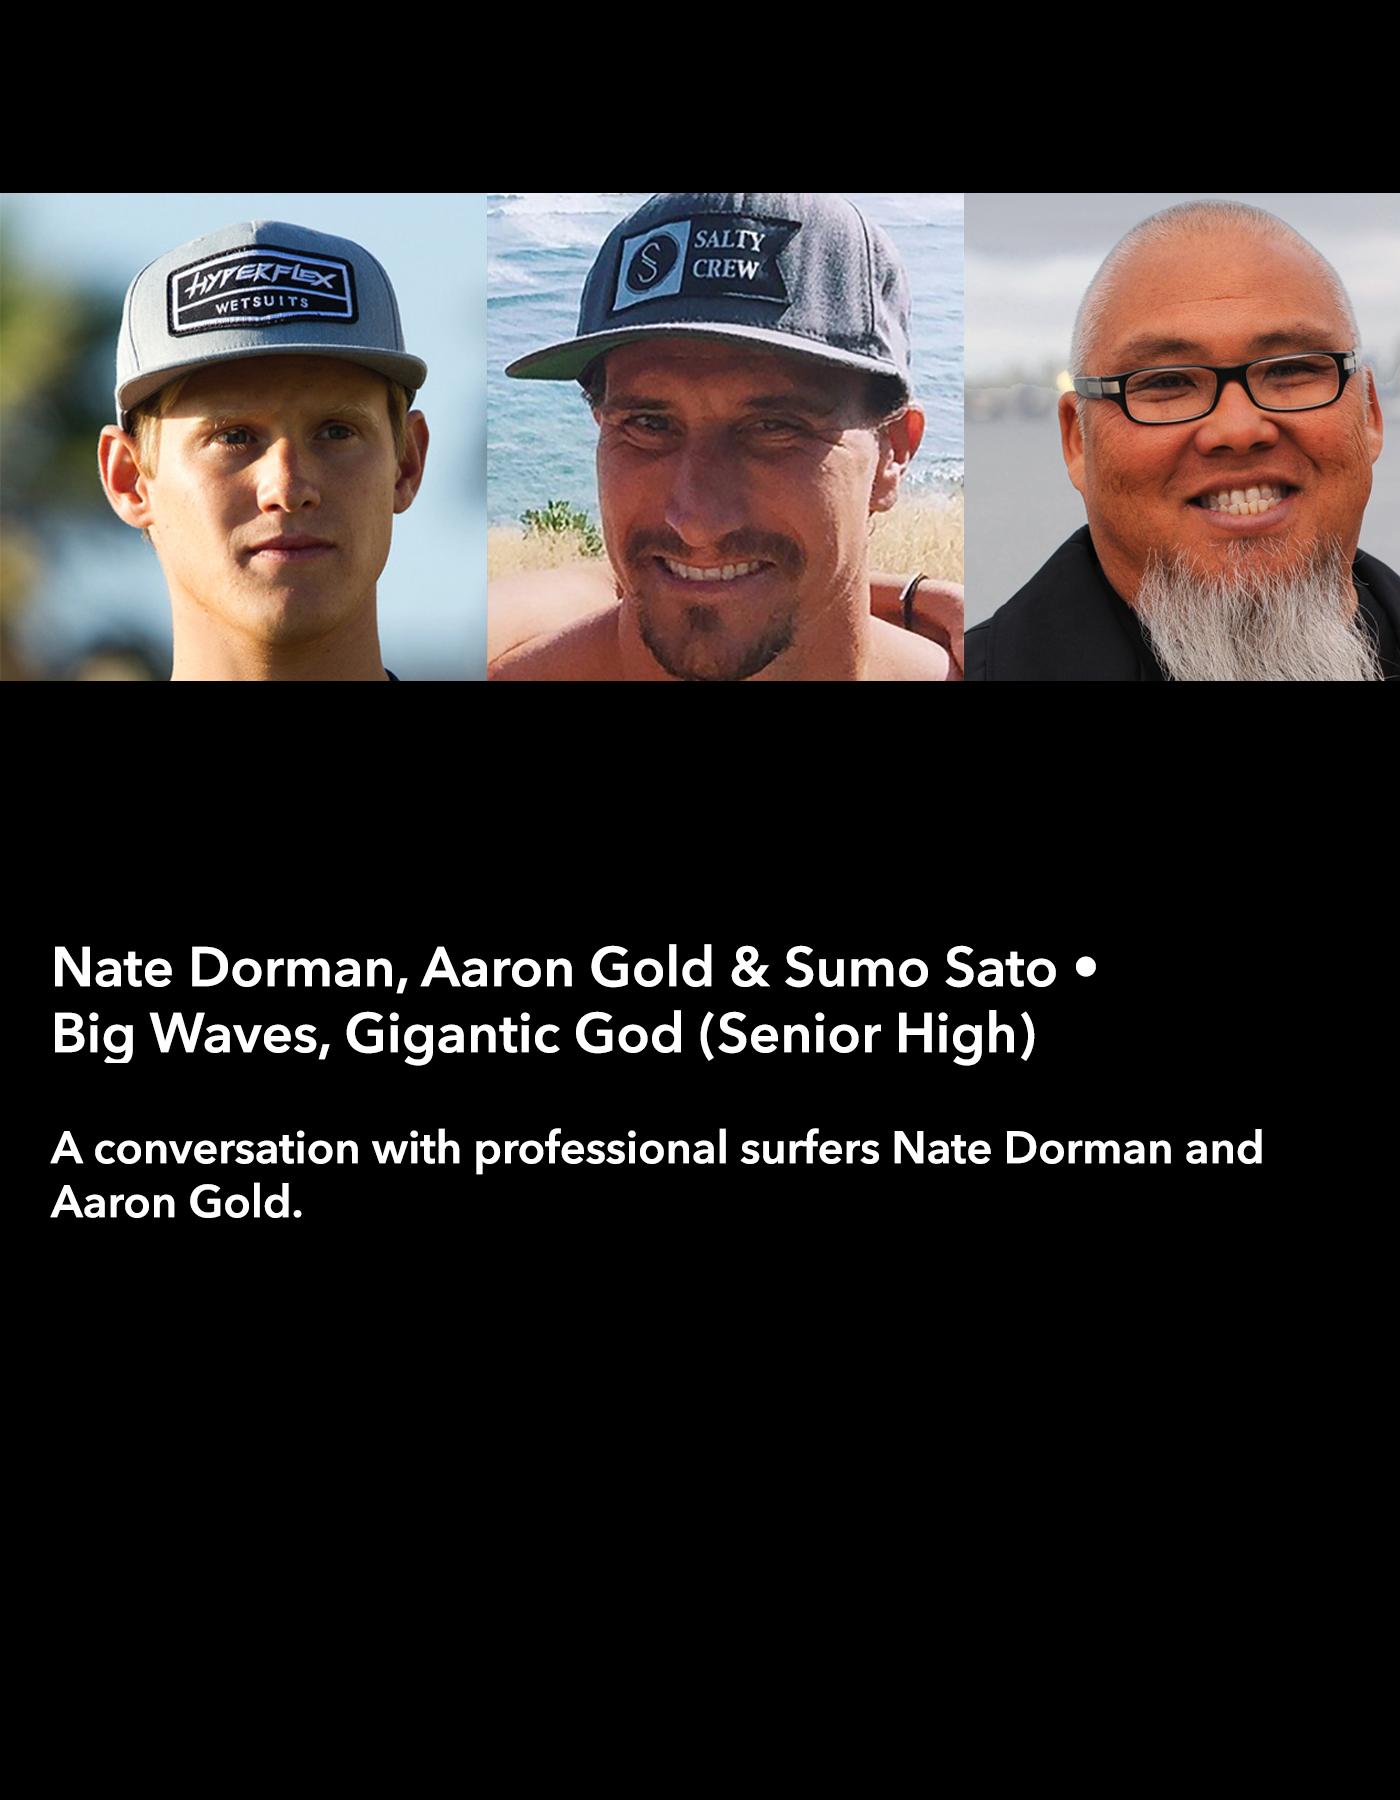 Nate Dorman, Aaron Gold & Sumo Sato • Big Waves, Gigantic God (Senior High) [Y] •Saturday Morning, March 18 • 10:30 – 11:45 am